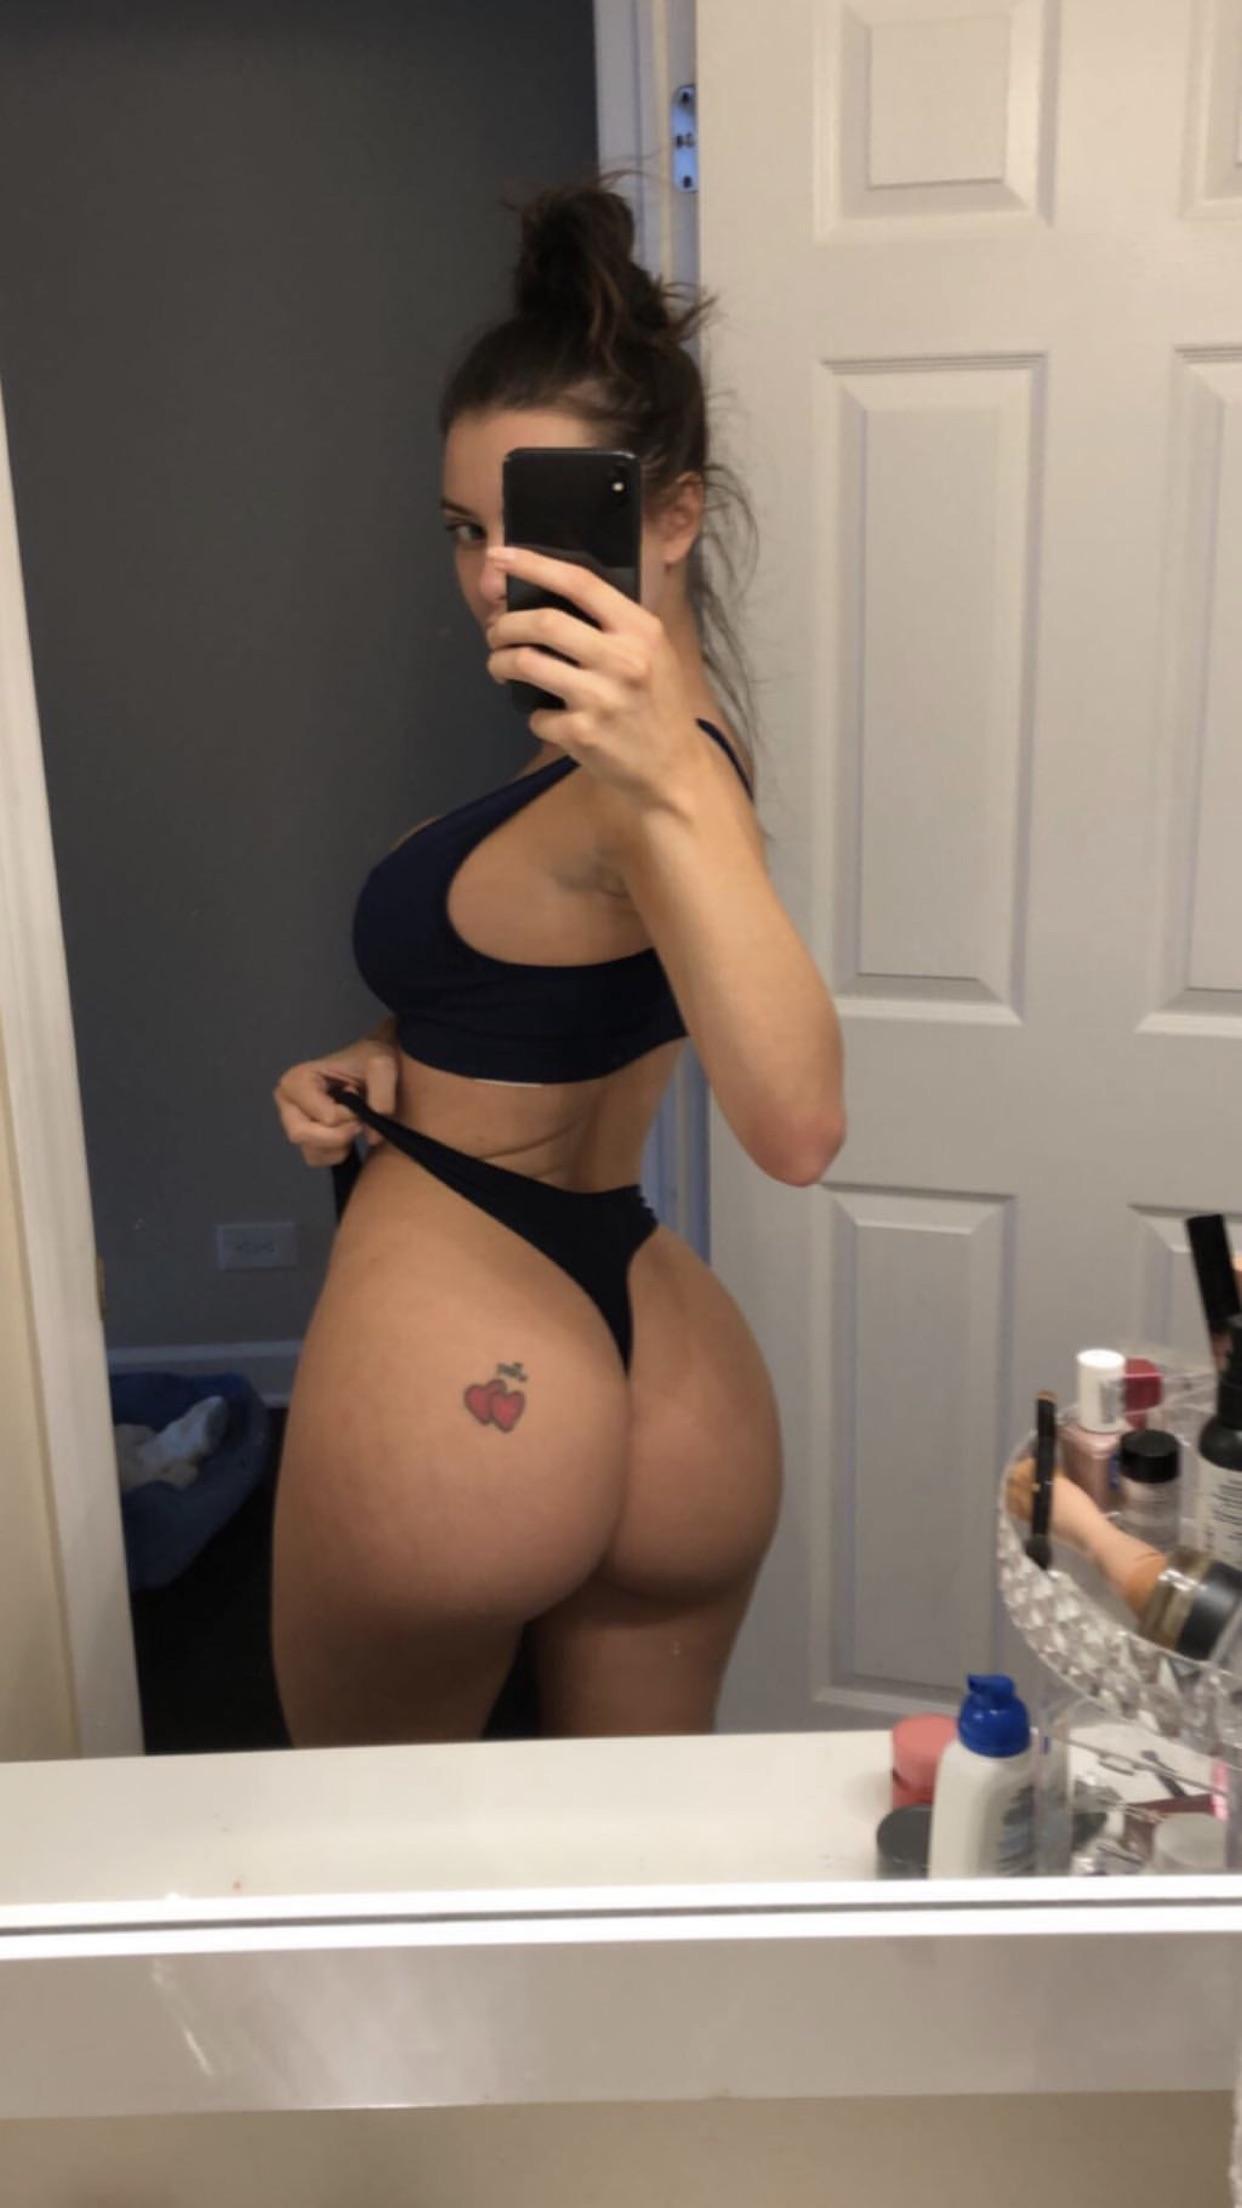 Lana Rhoades most hottest pornstar big booty - Lana Rhoades OnlyFans Nude Porn Videos